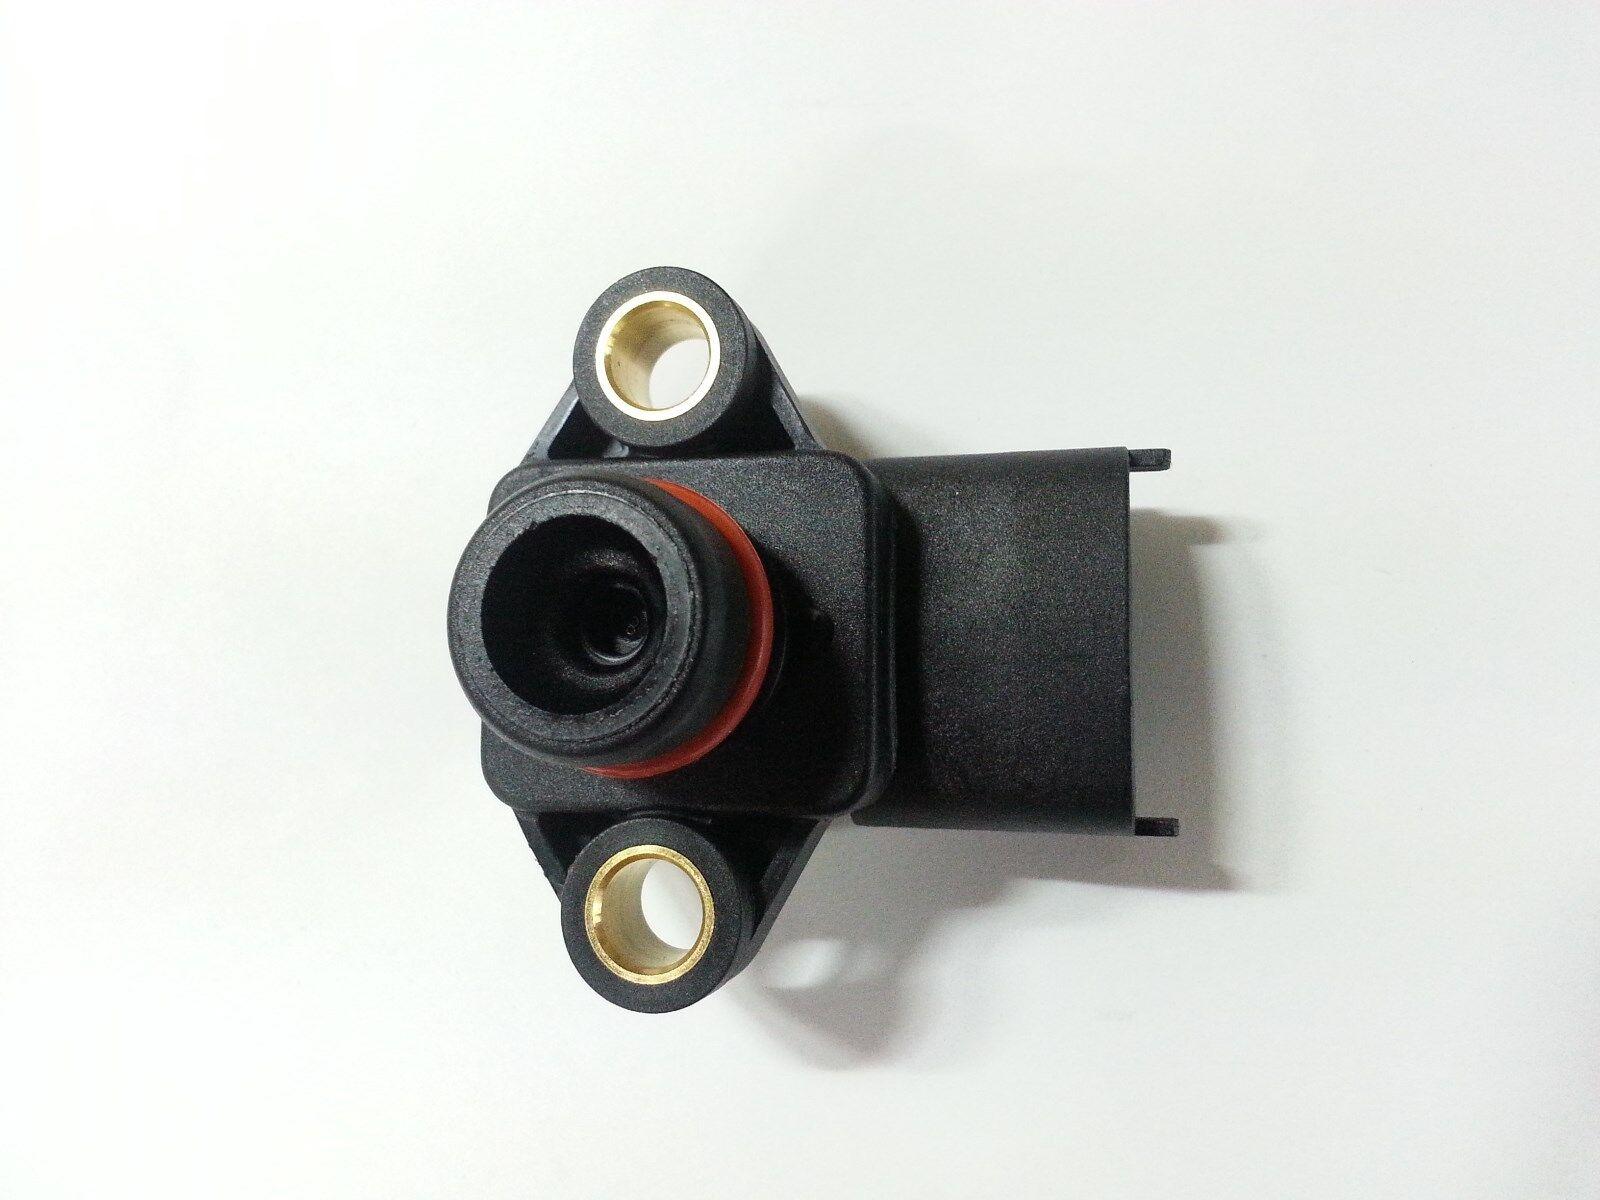 OEM Ssangyong Rexton 2003-2007  Turbo  Booster Pressure Sensor,6655423117 euro3